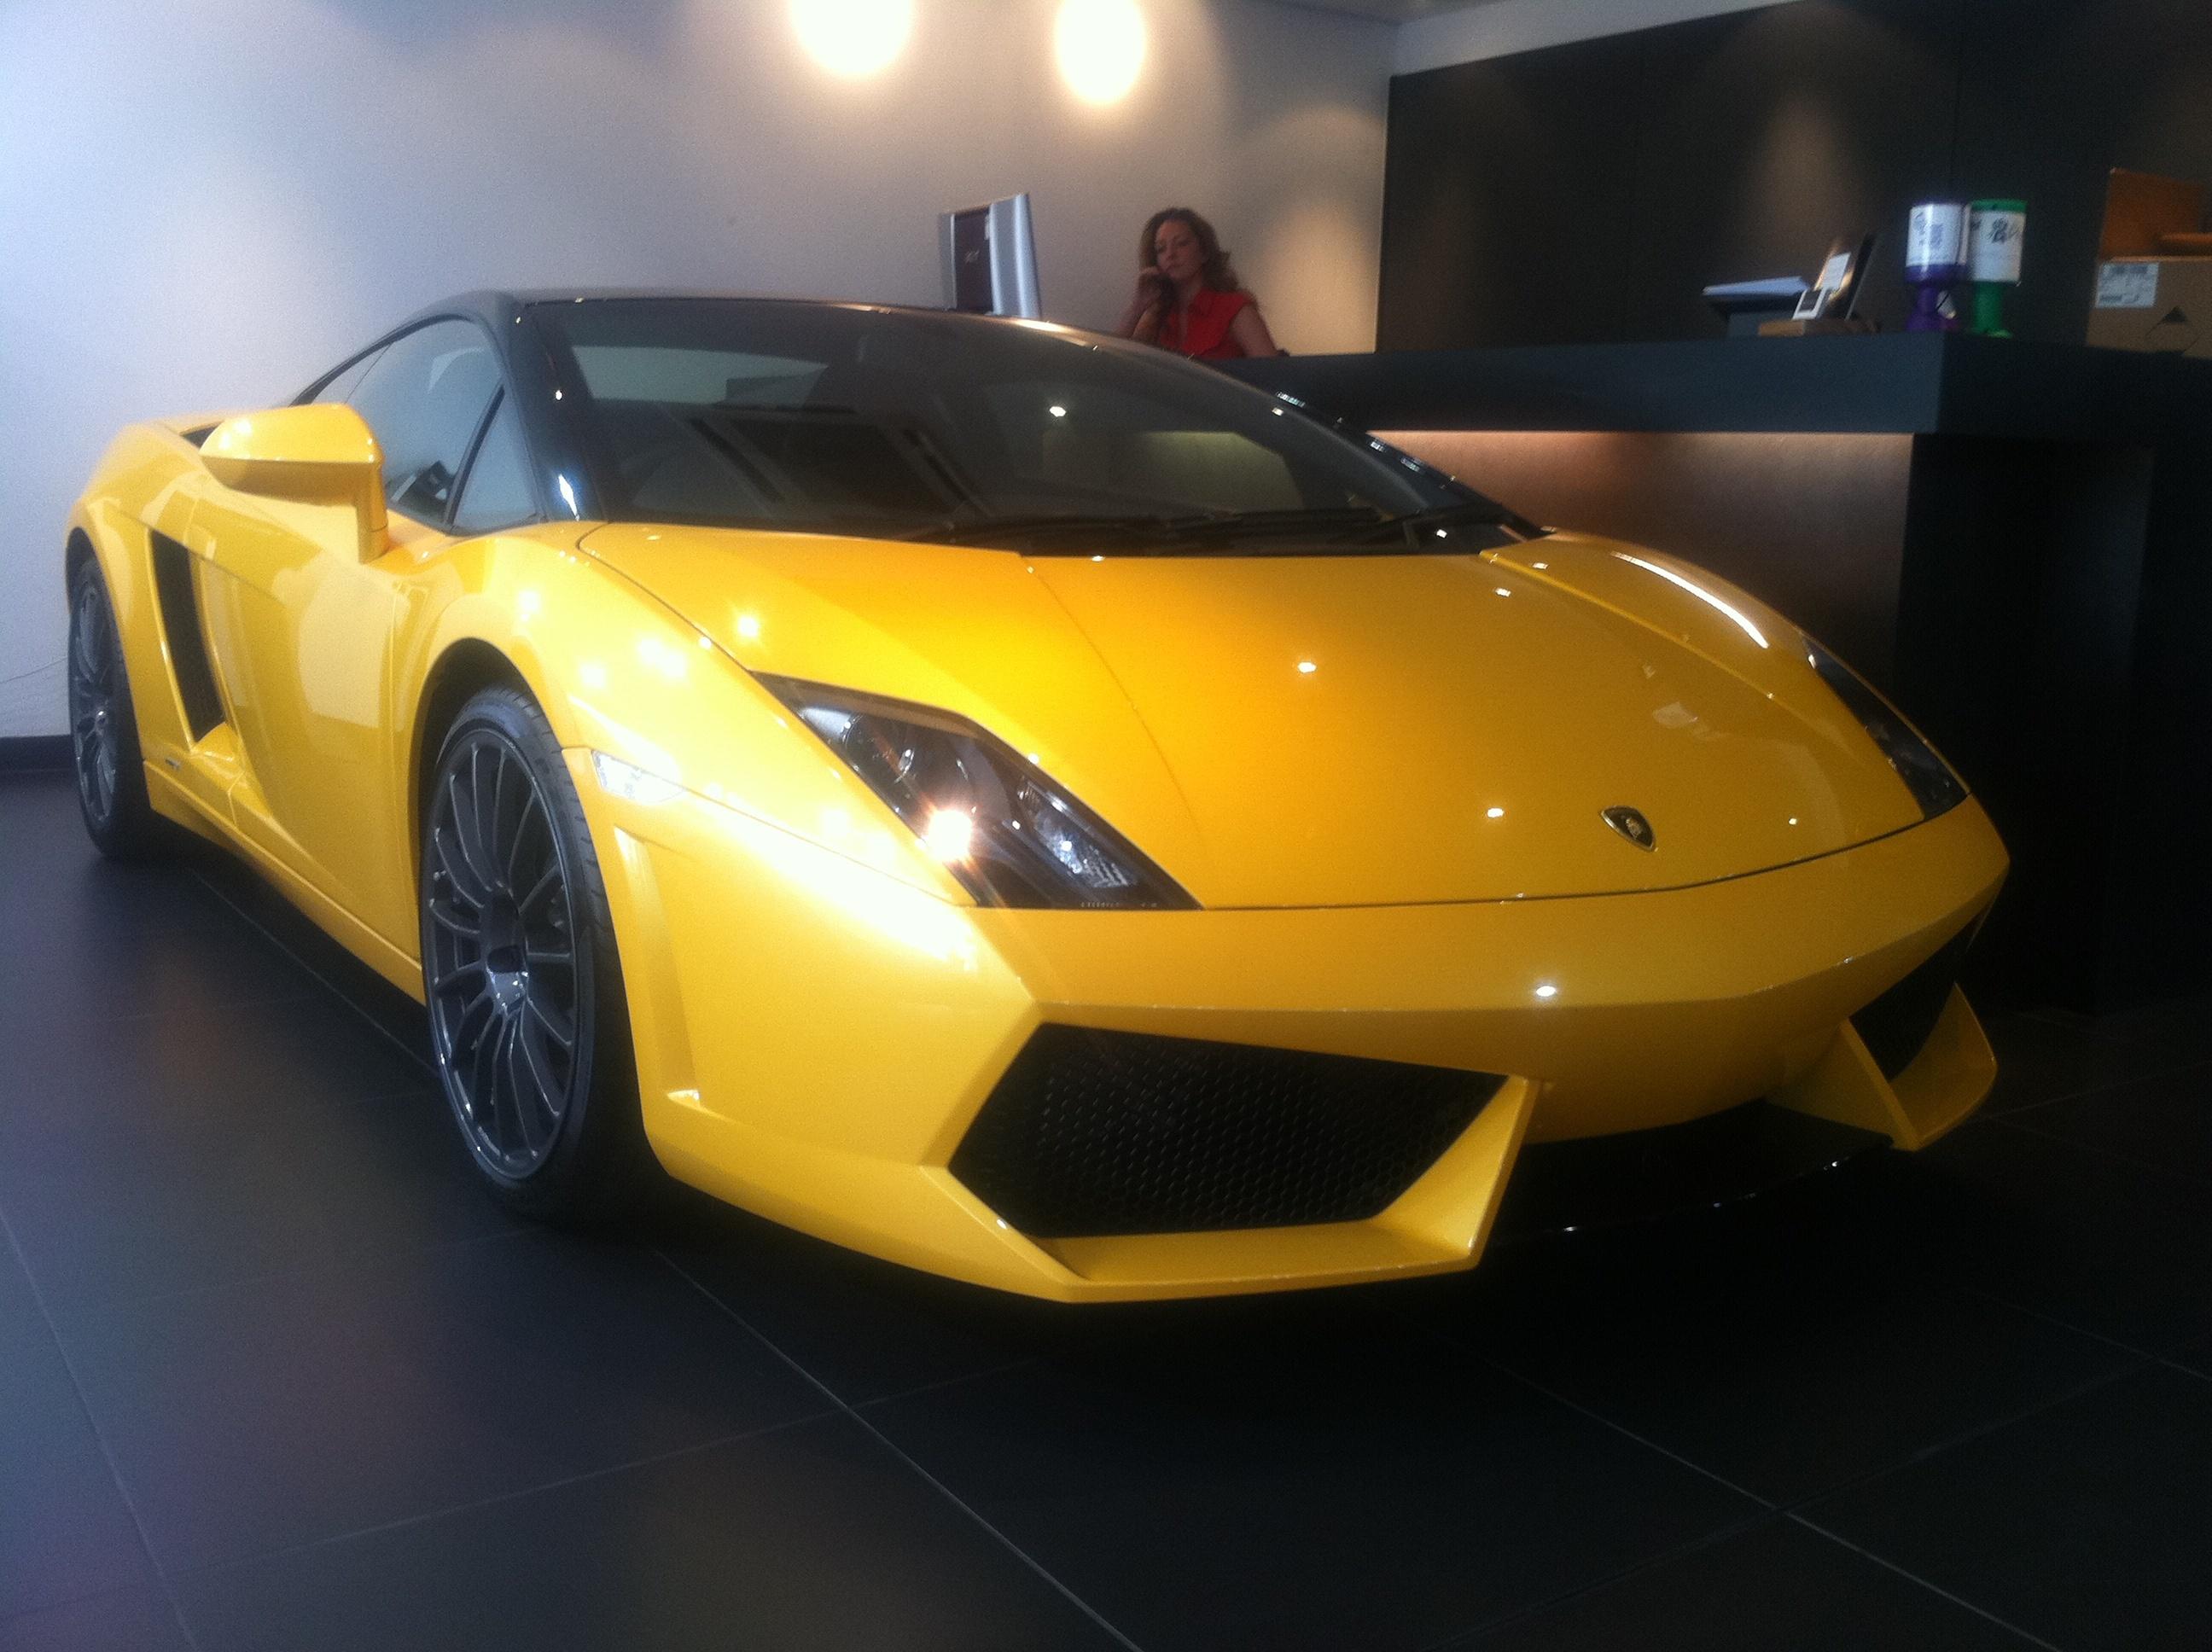 File Lamborghini Lp570 4 Gallardo Yellow Black 6390309781 Jpg